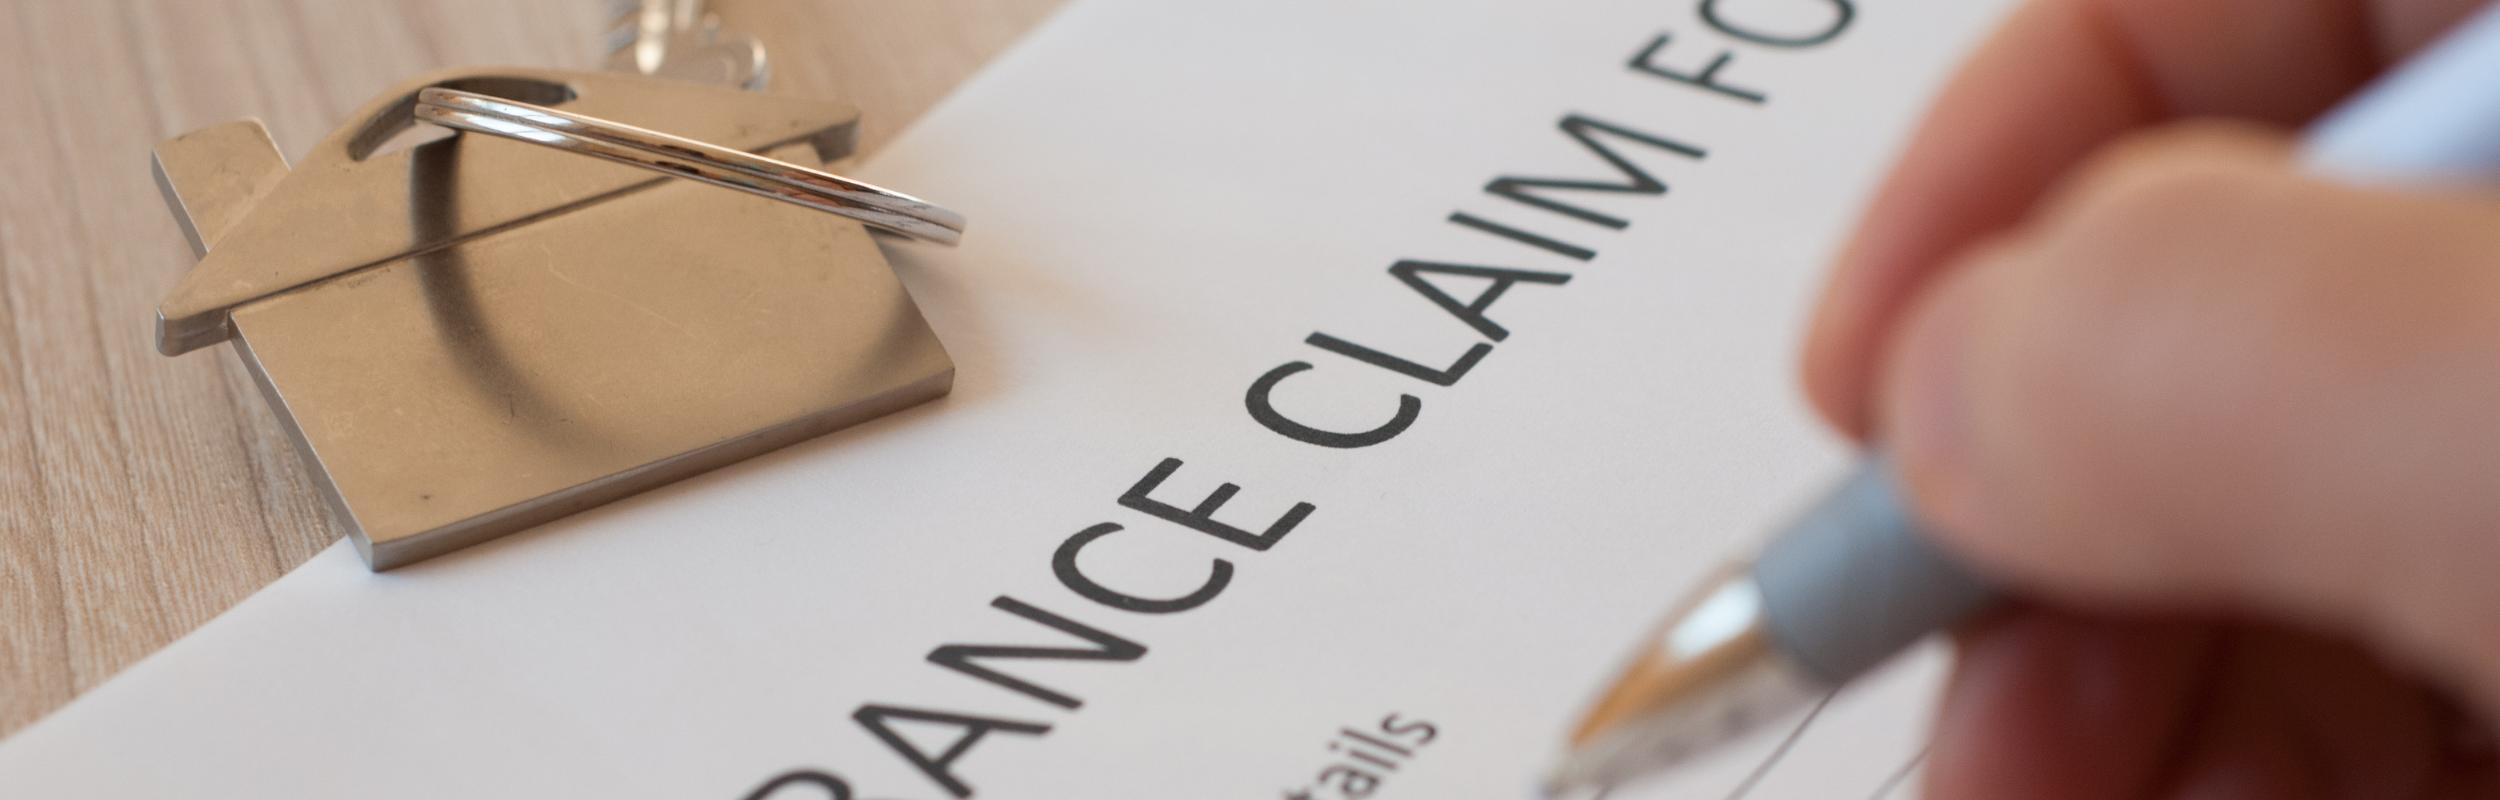 Avansic Case Study - Insurance Claim